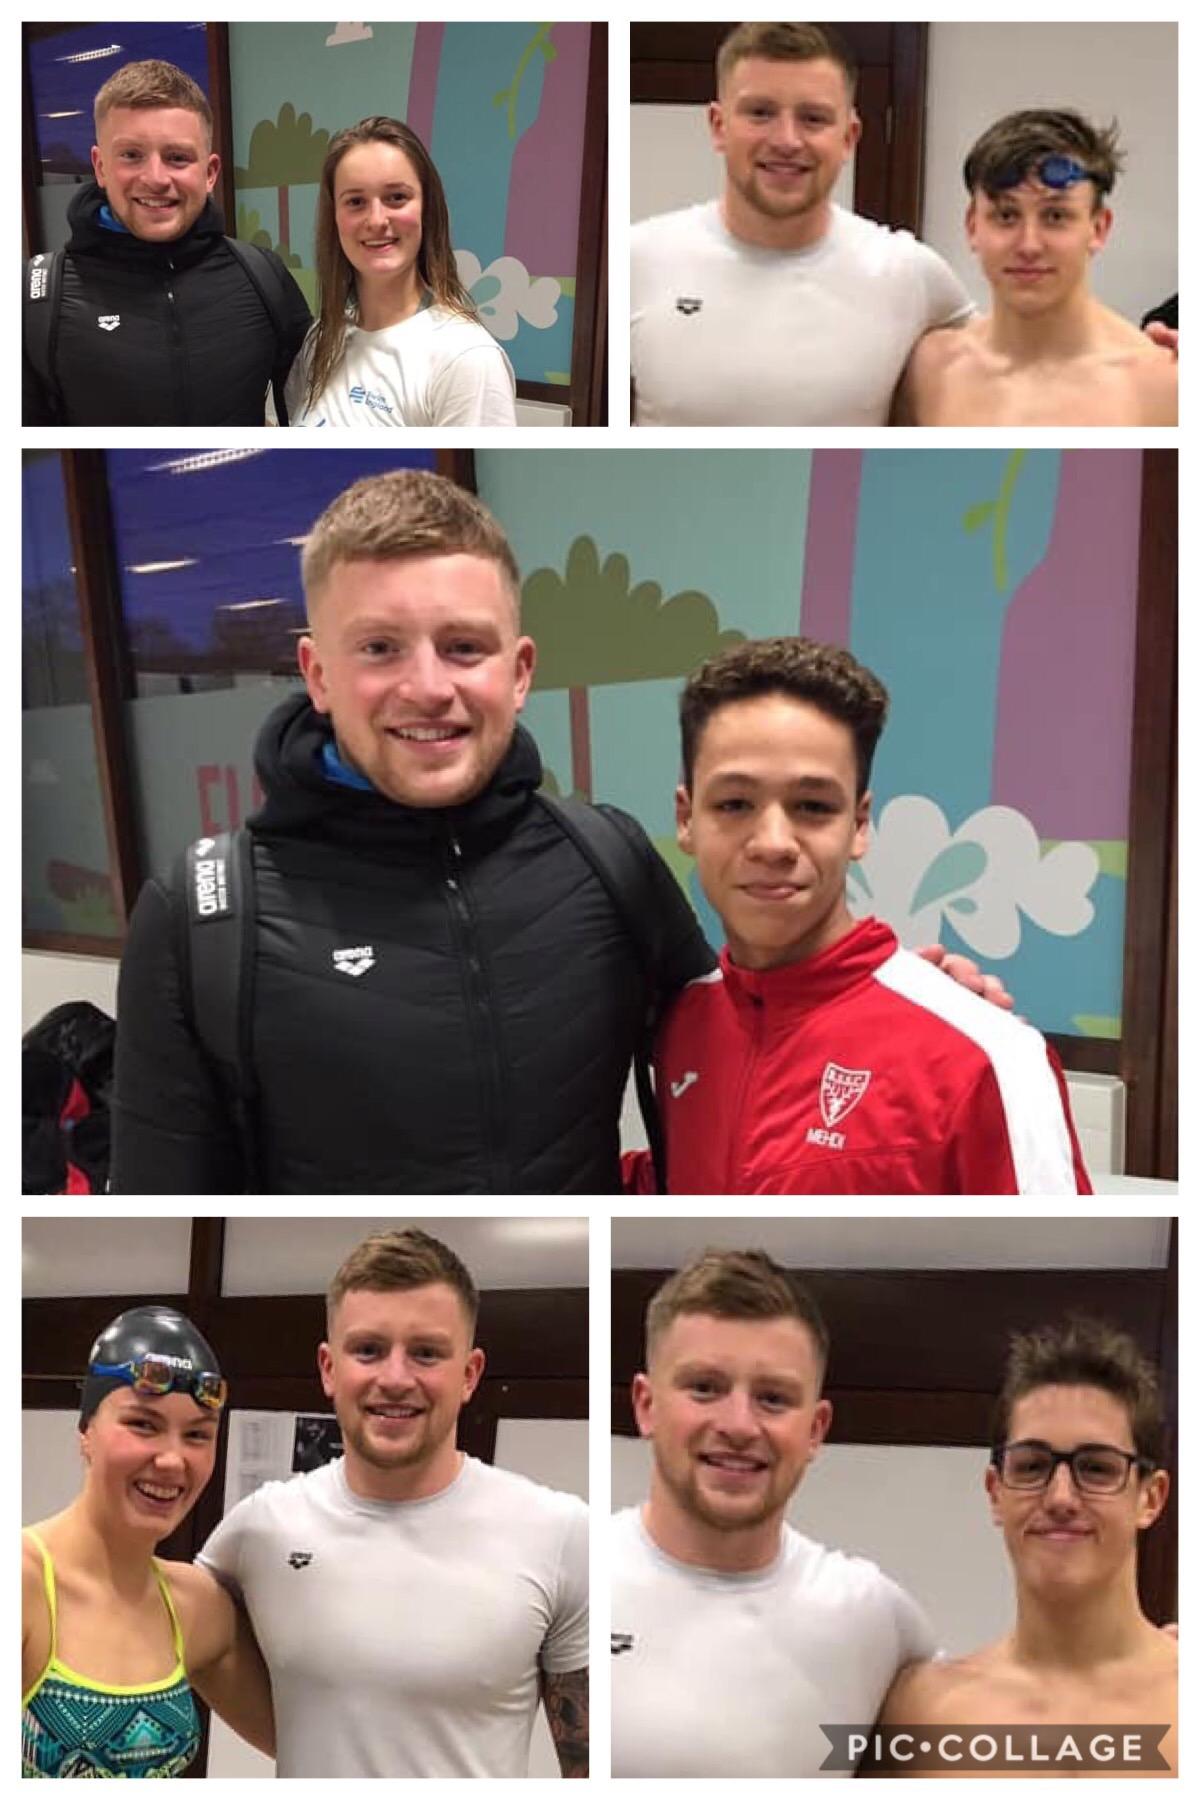 BSSC Swimmers Meet Team GB – Bishop's Stortford Swimming Club